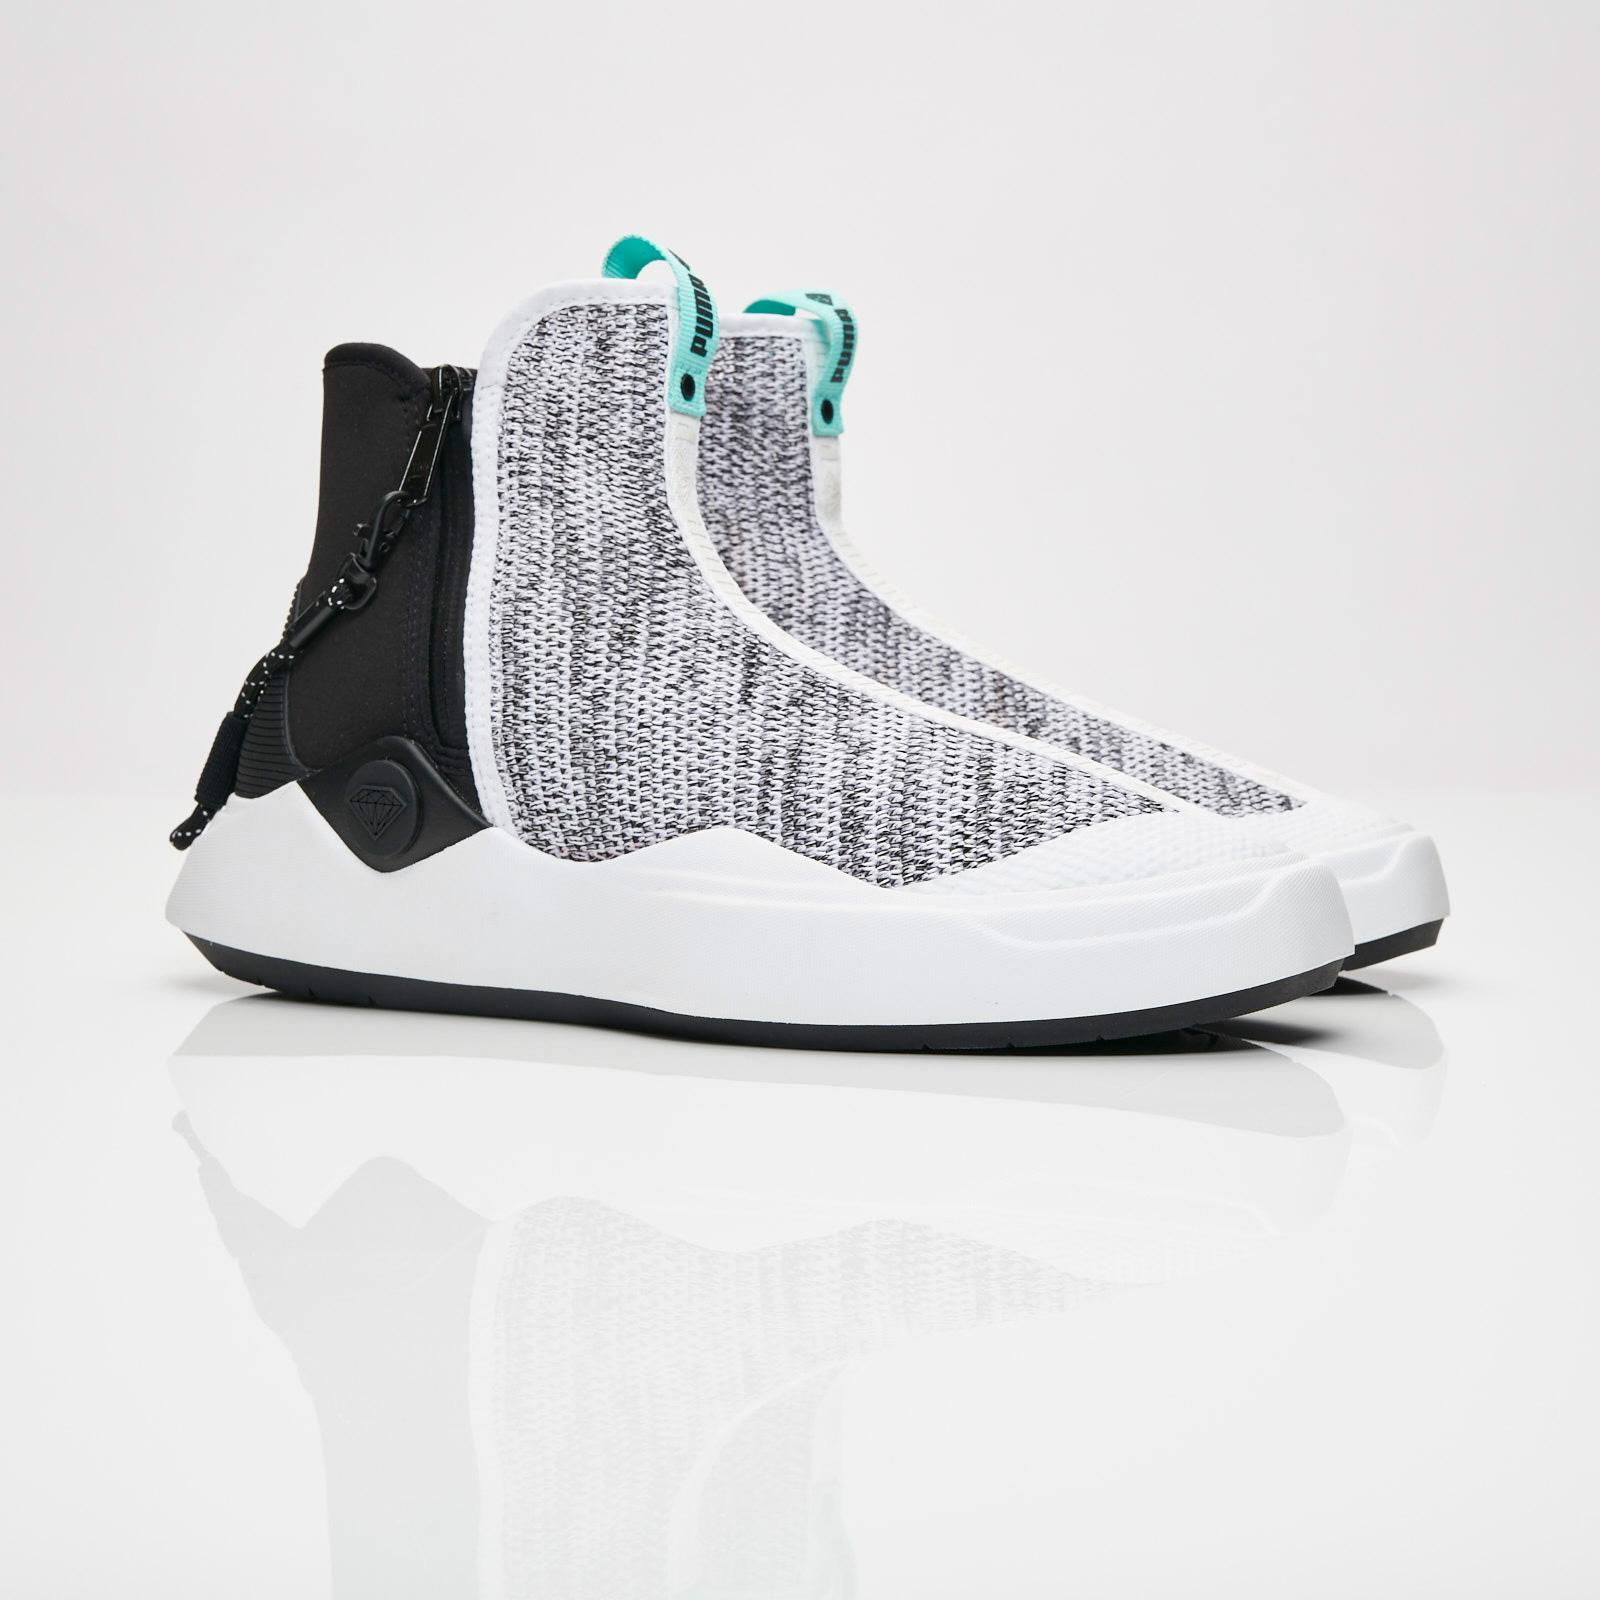 100% authentique fb317 562fe Puma Abyss Knit DIAMOND - 366493-01 - Sneakersnstuff ...